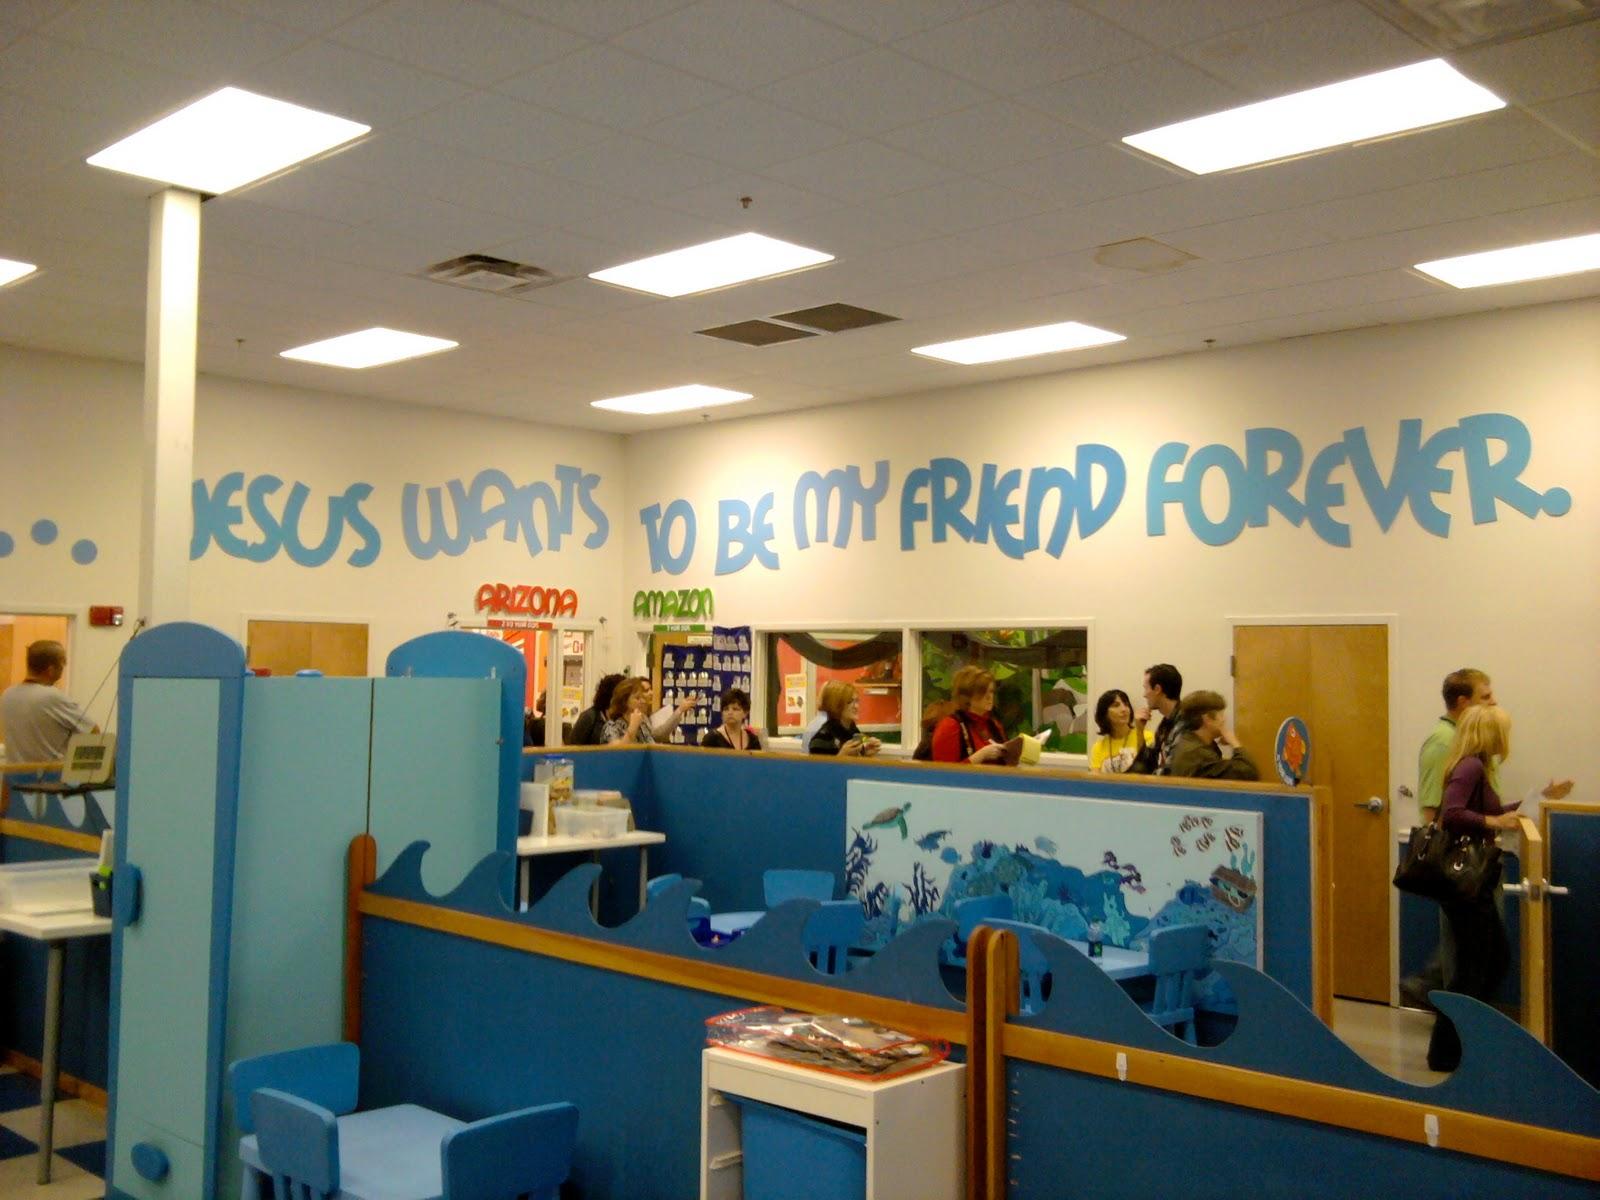 Church Classroom Decoration ~ Images about classroom decor on pinterest bulletin